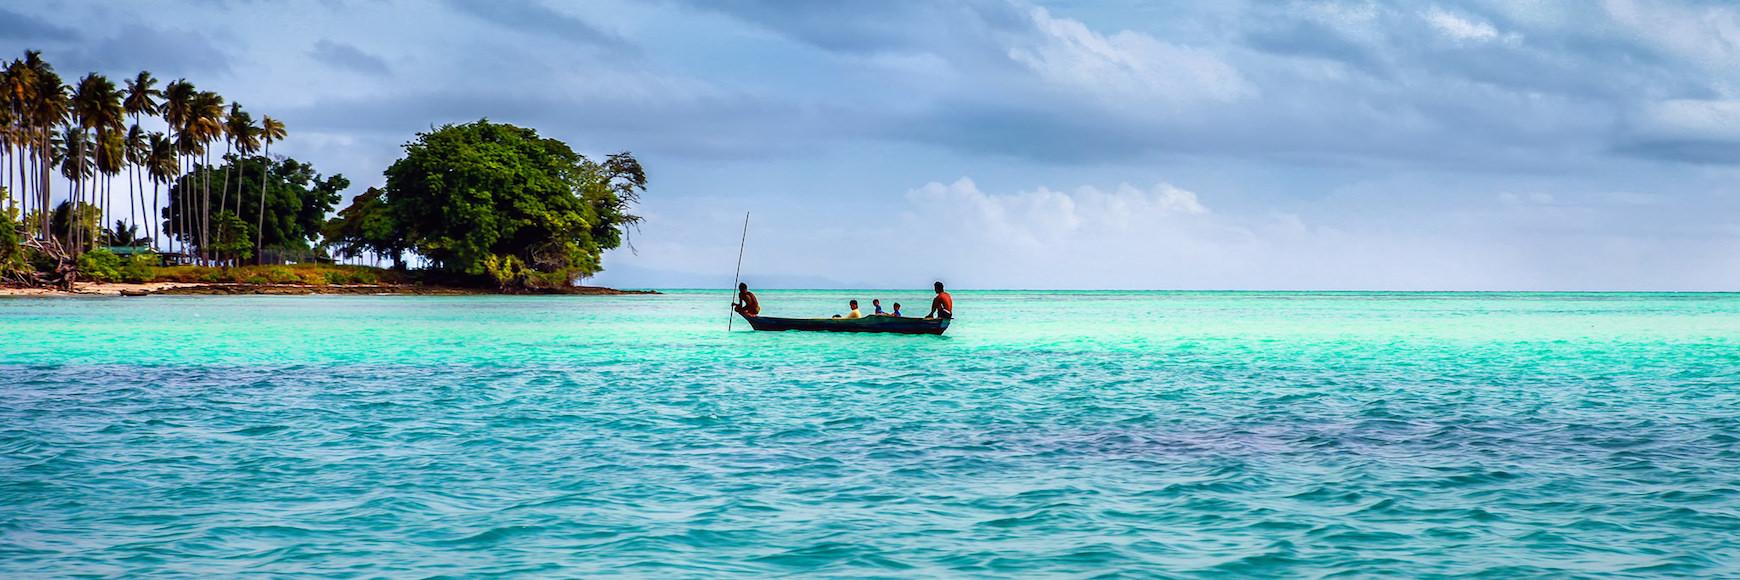 noleggio barca a vela Malesia